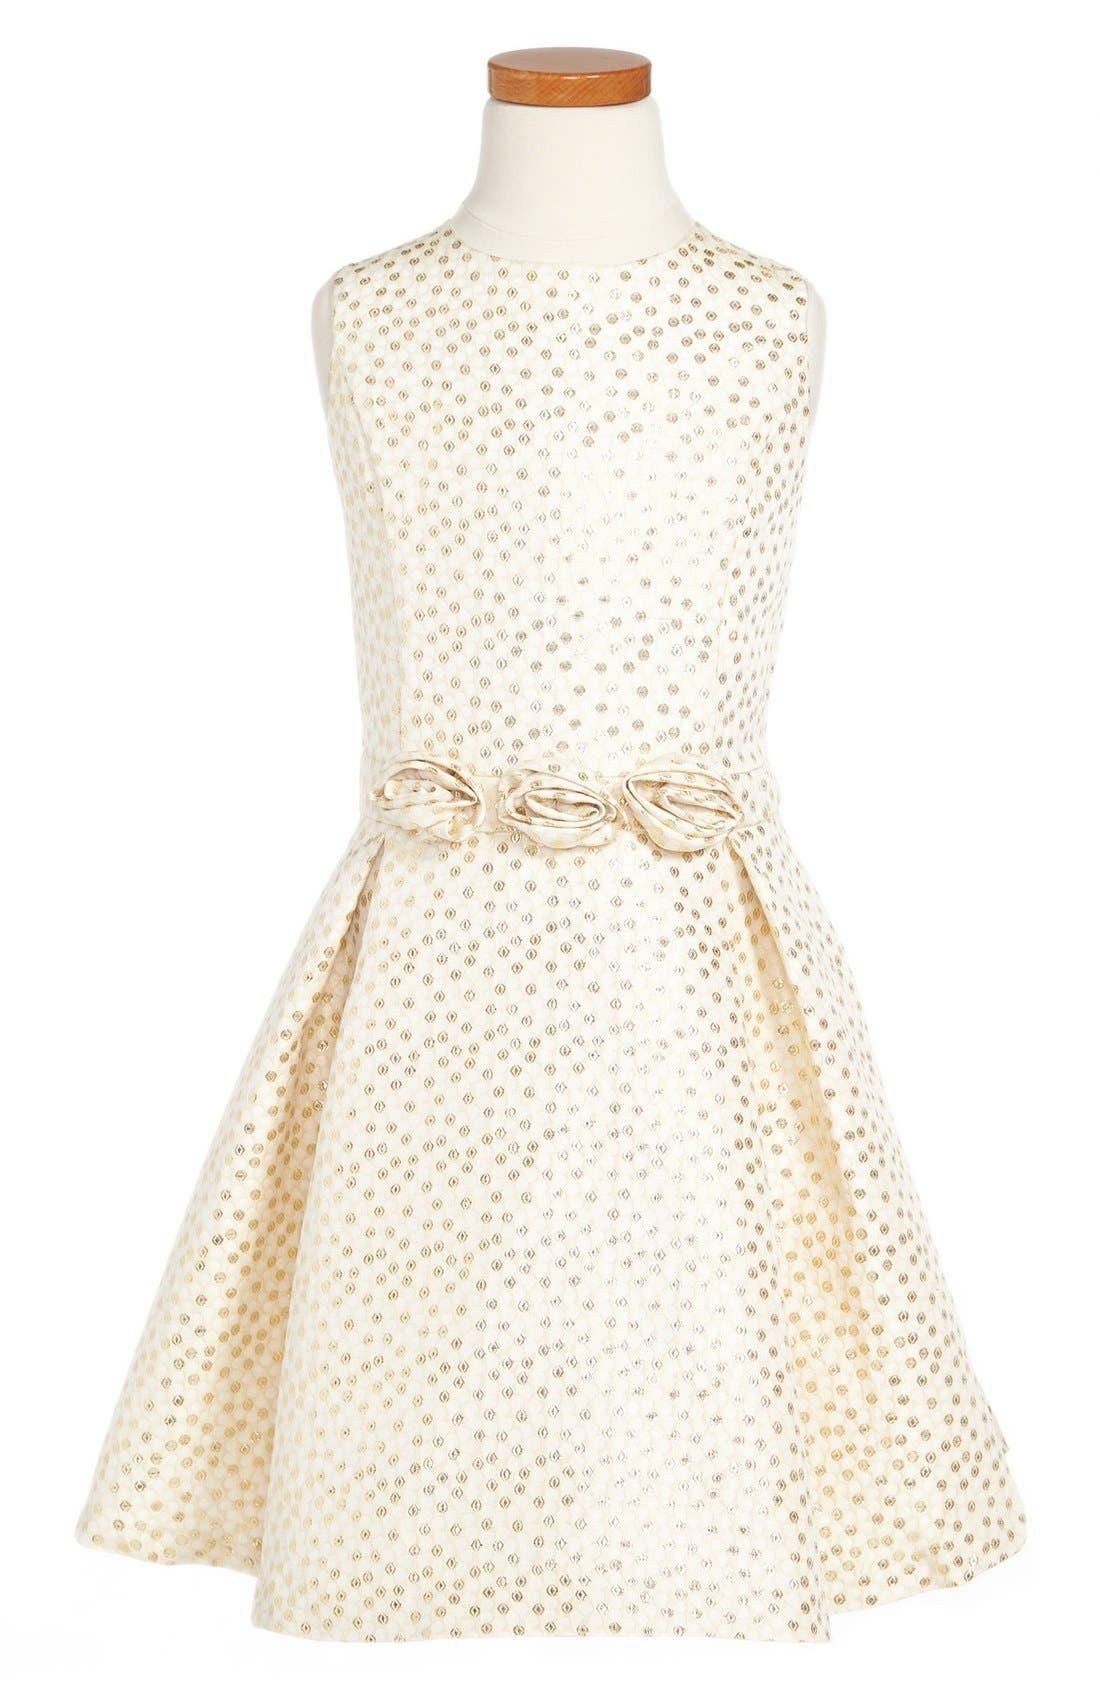 Main Image - ABS by Allen Schwartz Sleeveless Box Pleat Dress (Big Girls)